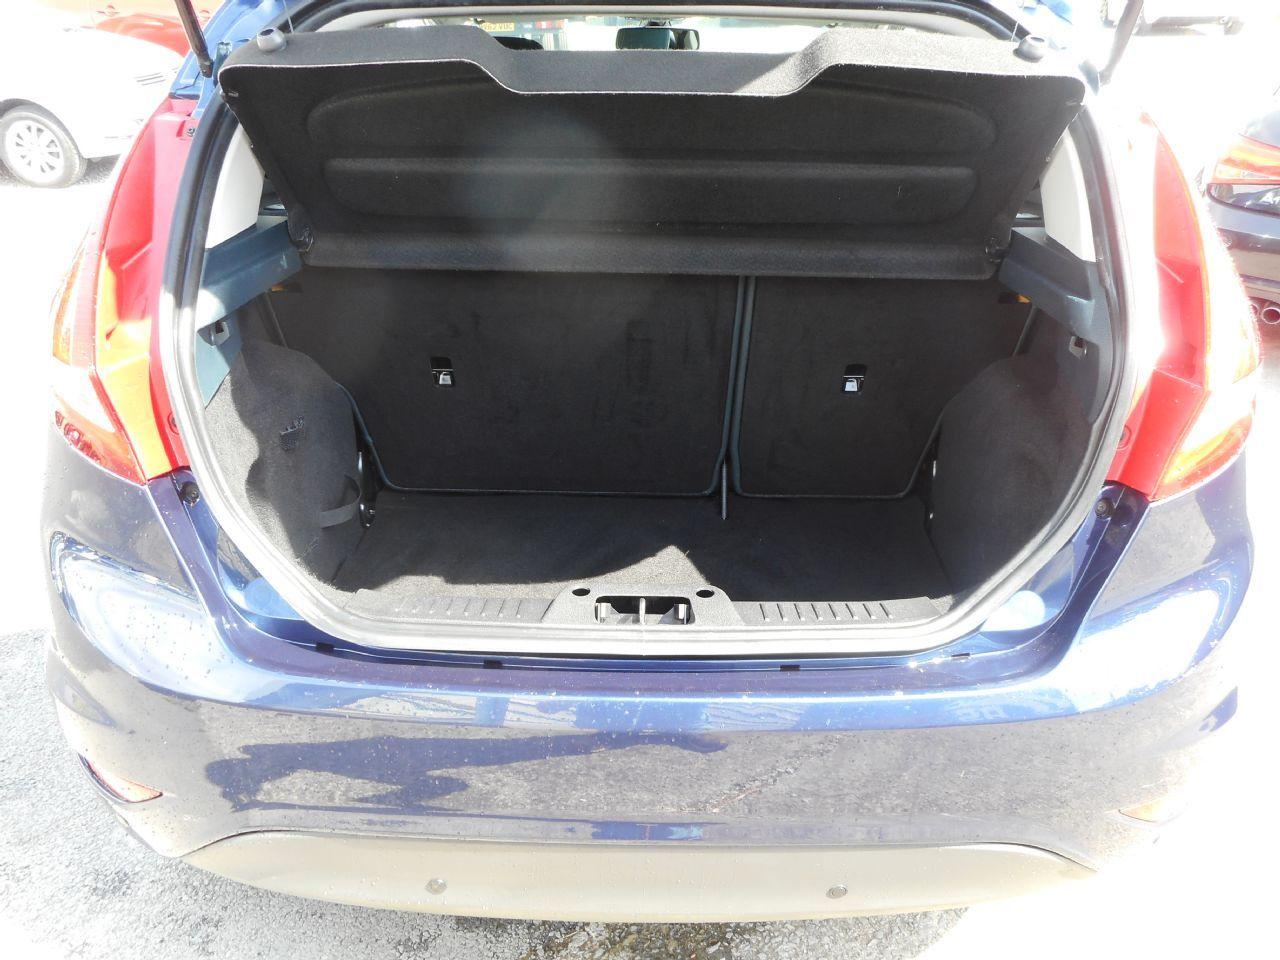 FORD Fiesta Titanium 1.4 096 Auto (2012) - Picture 15